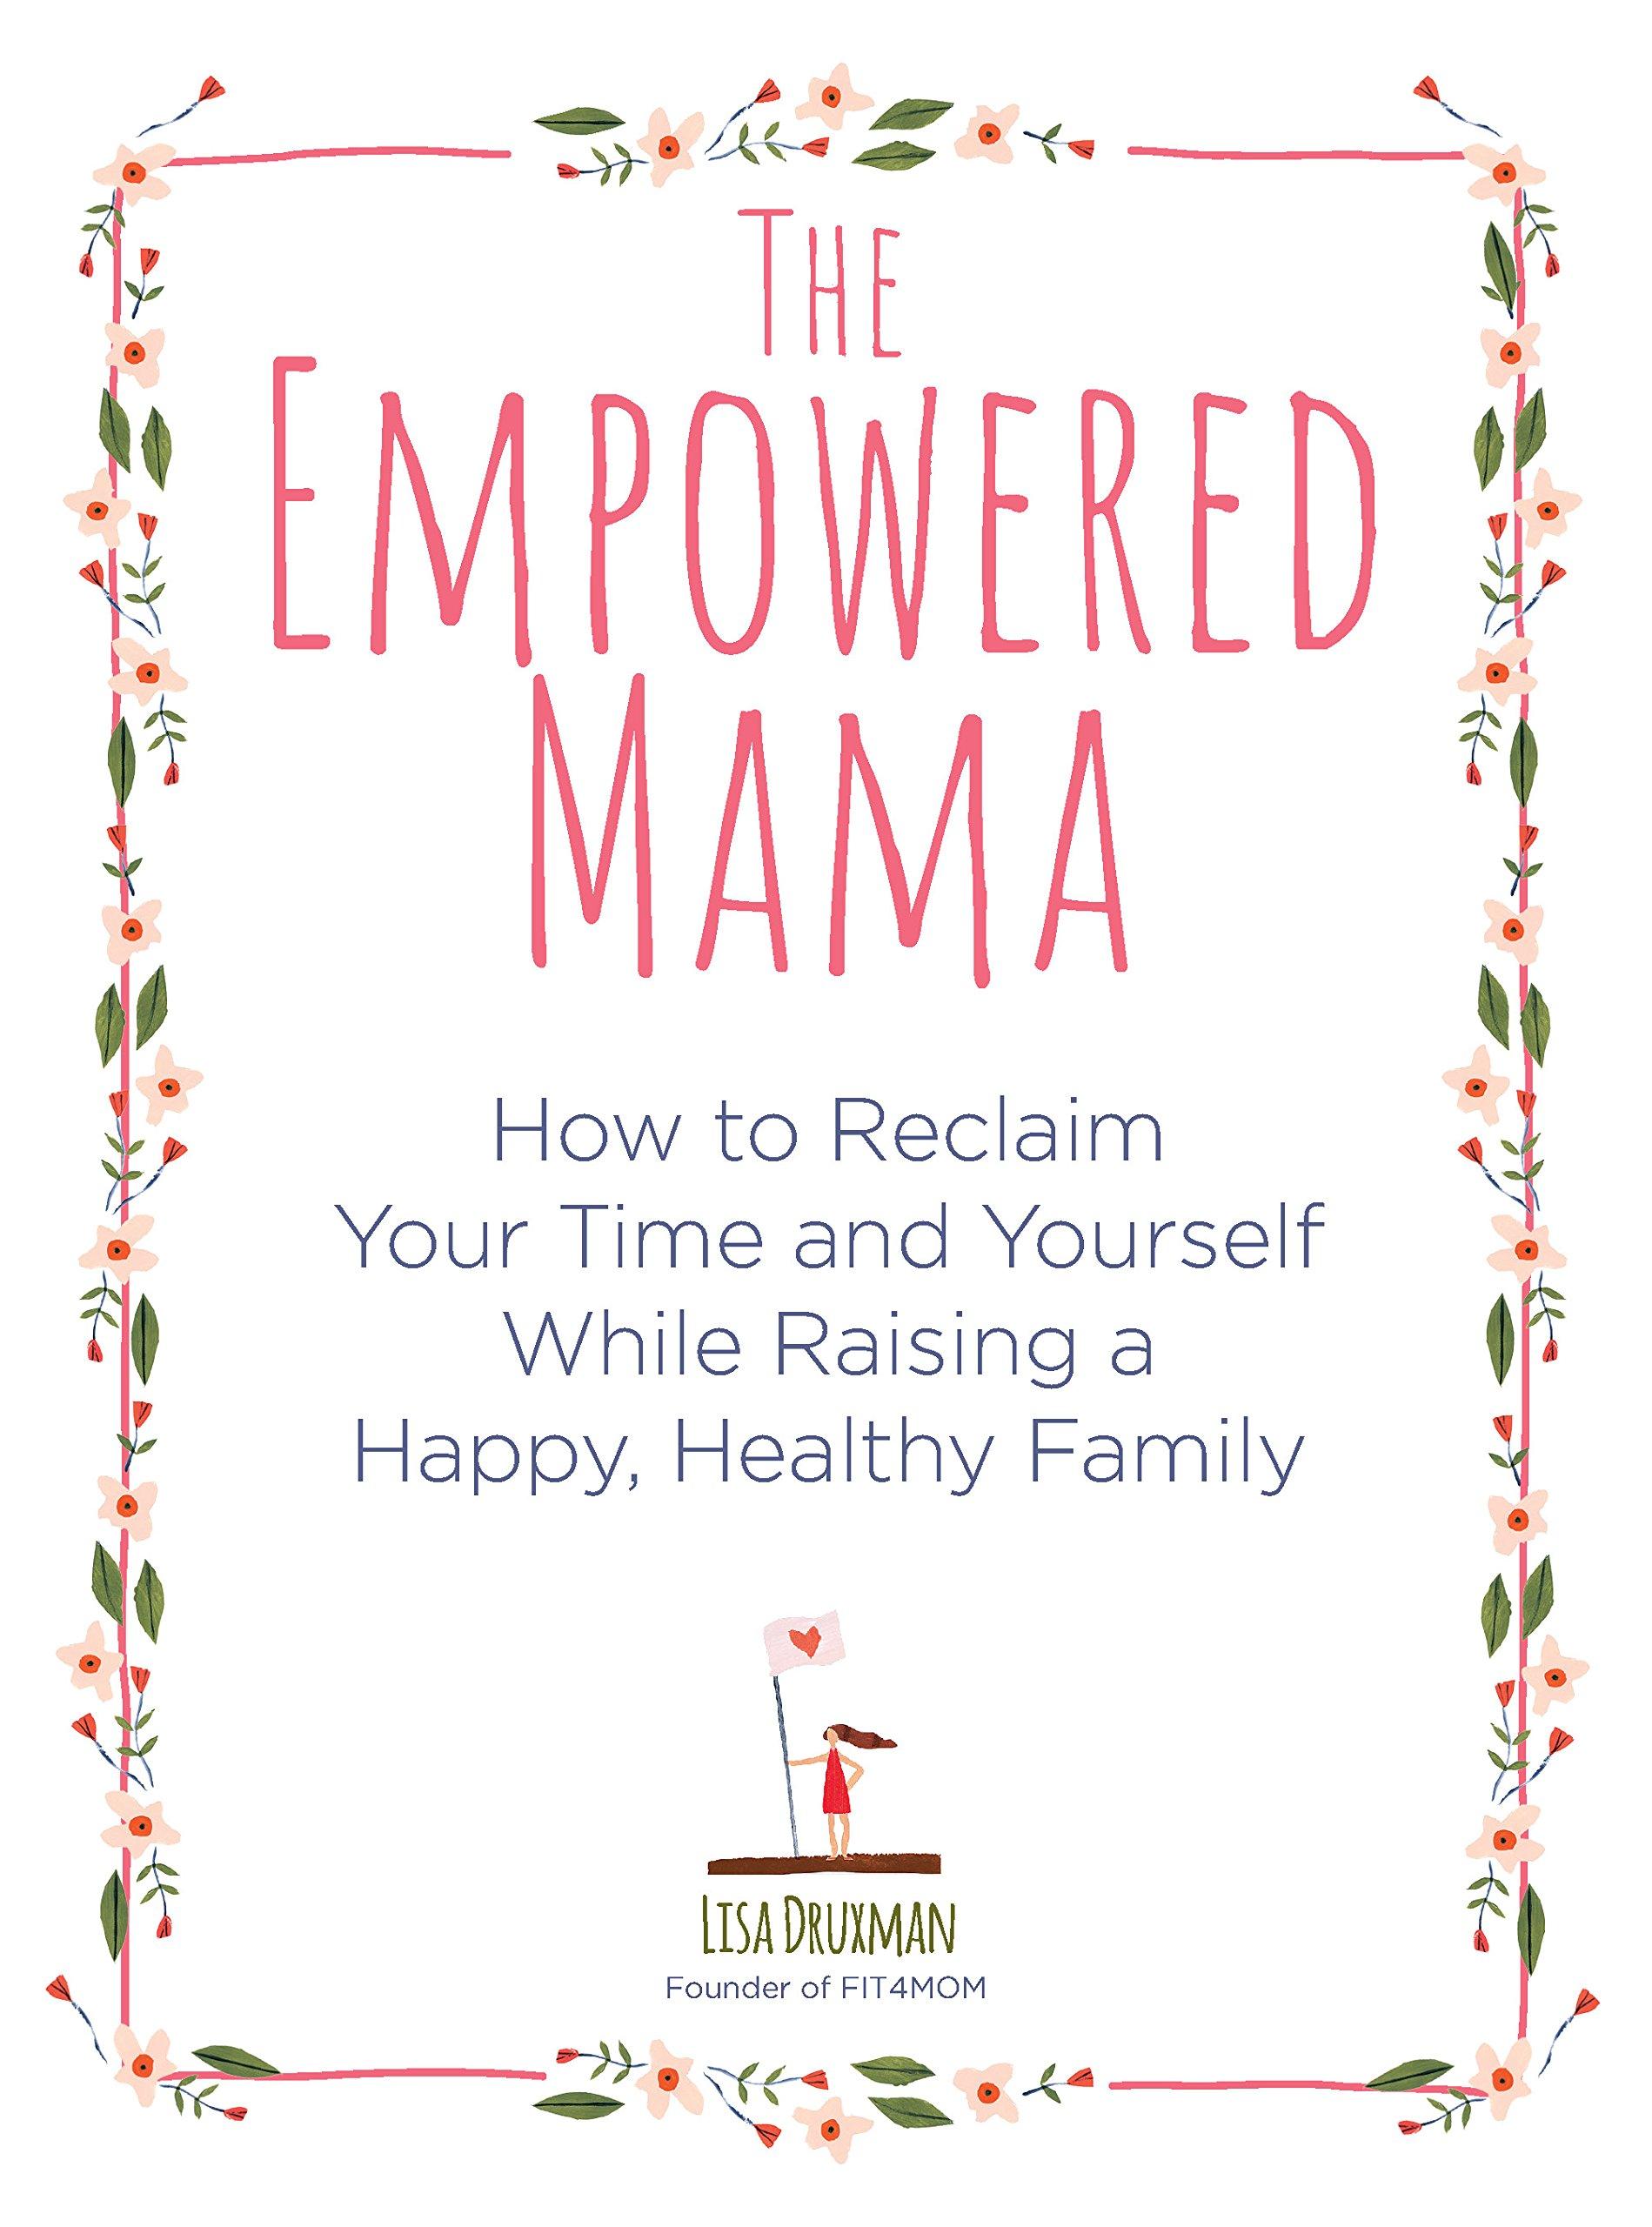 Empowered Mama Reclaim Yourself Raising product image